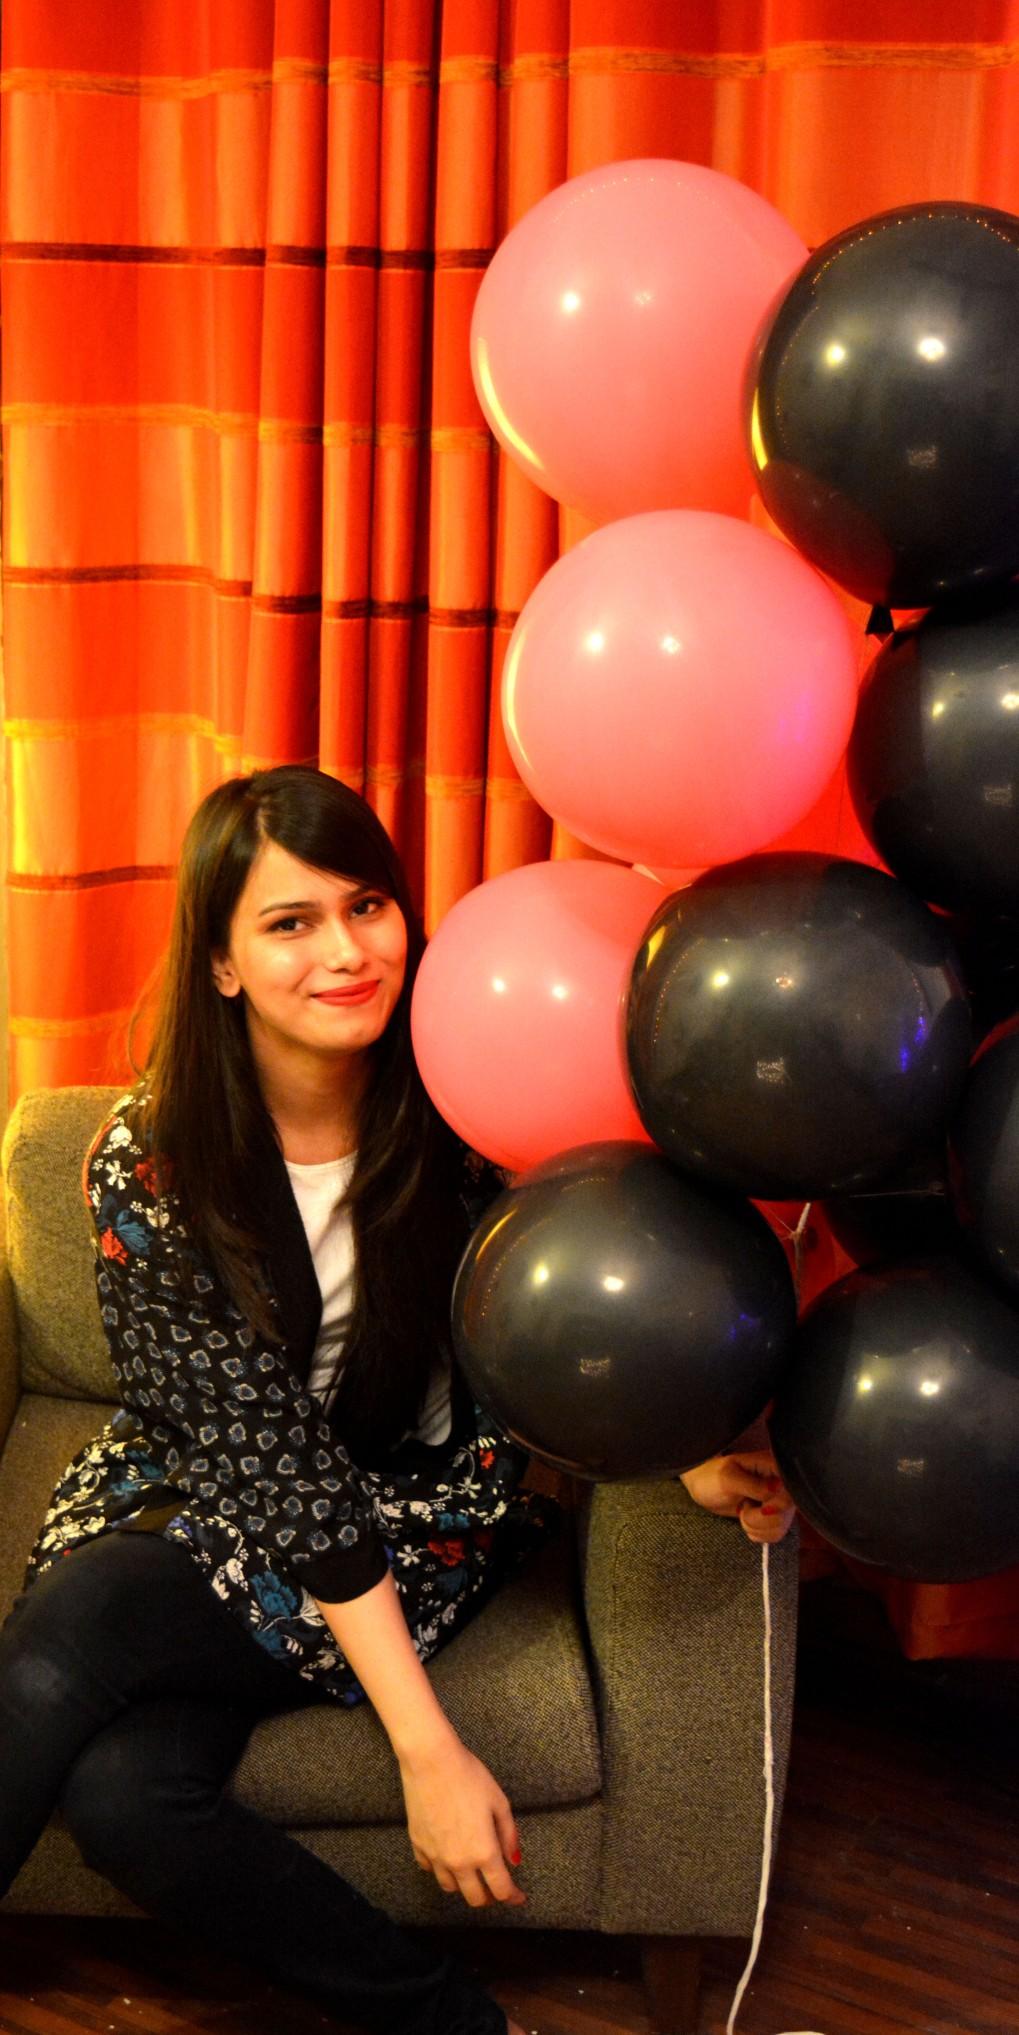 Chubby Cheeks +Birthday Balloons Bliss!